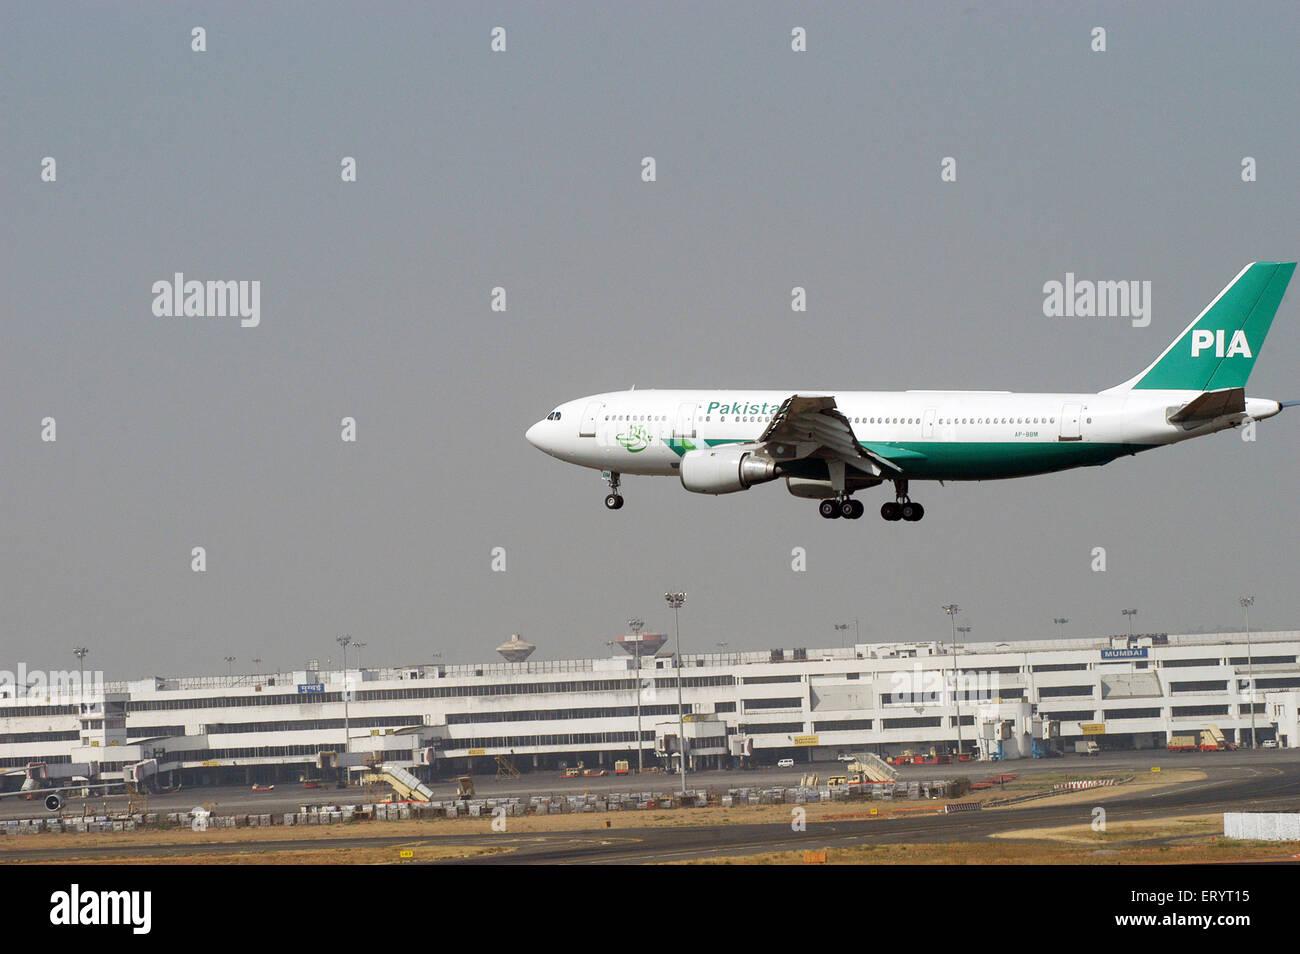 Pakistan international airline commercial plane landing at Sahar airport Chatrapati Shivaji International airport - Stock Image